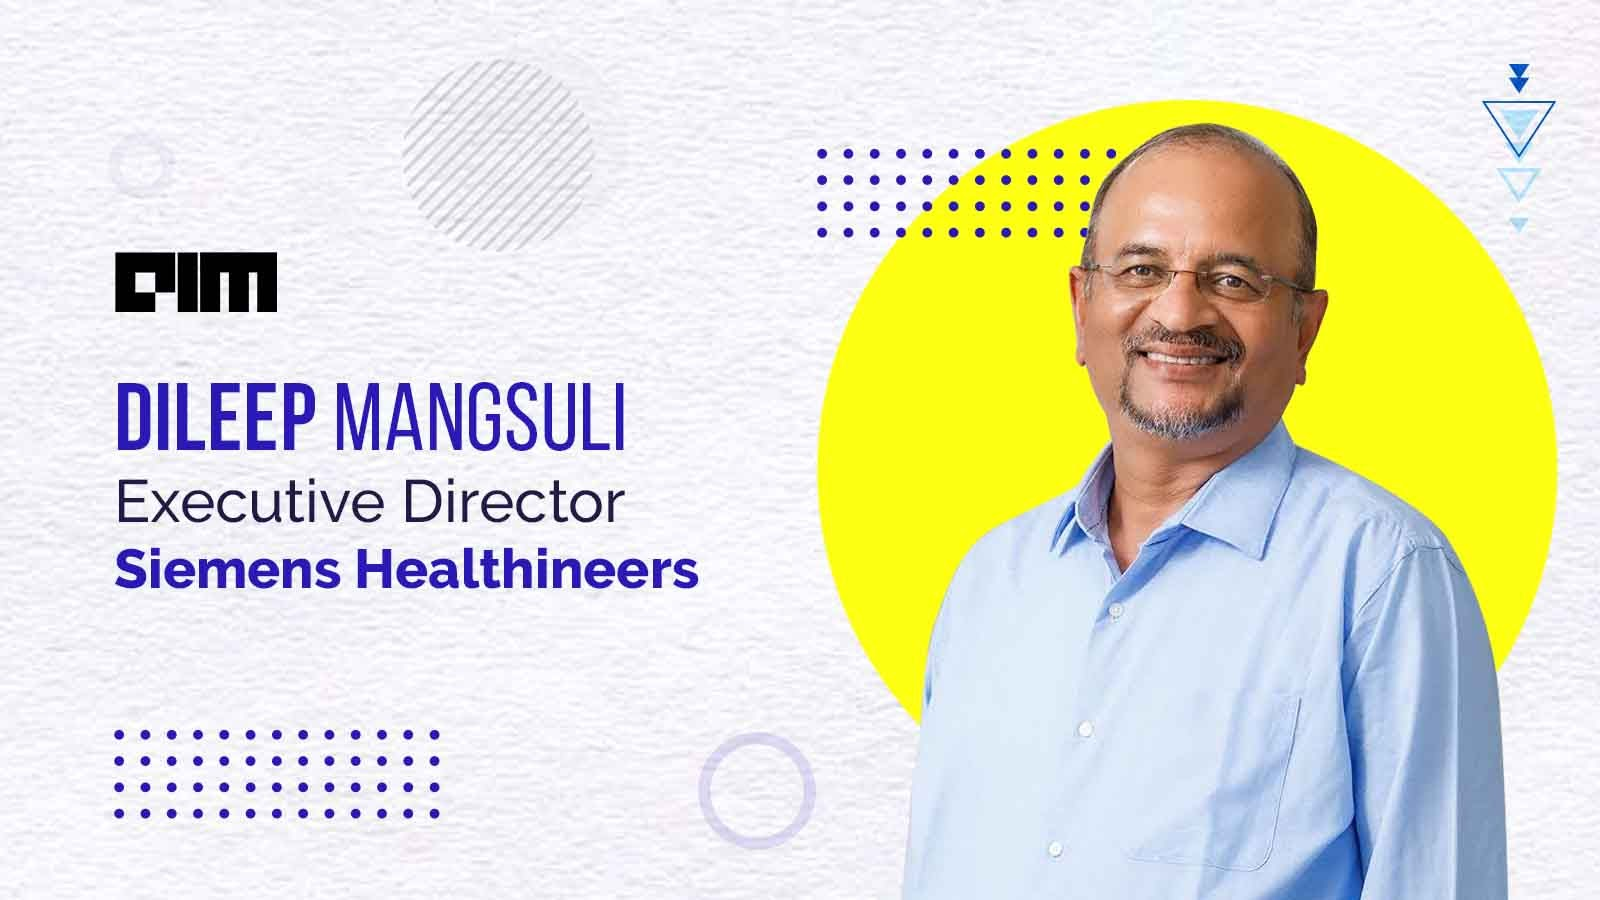 Digital Technologies Have Made Medicine More Precise: Dileep Mangsuli